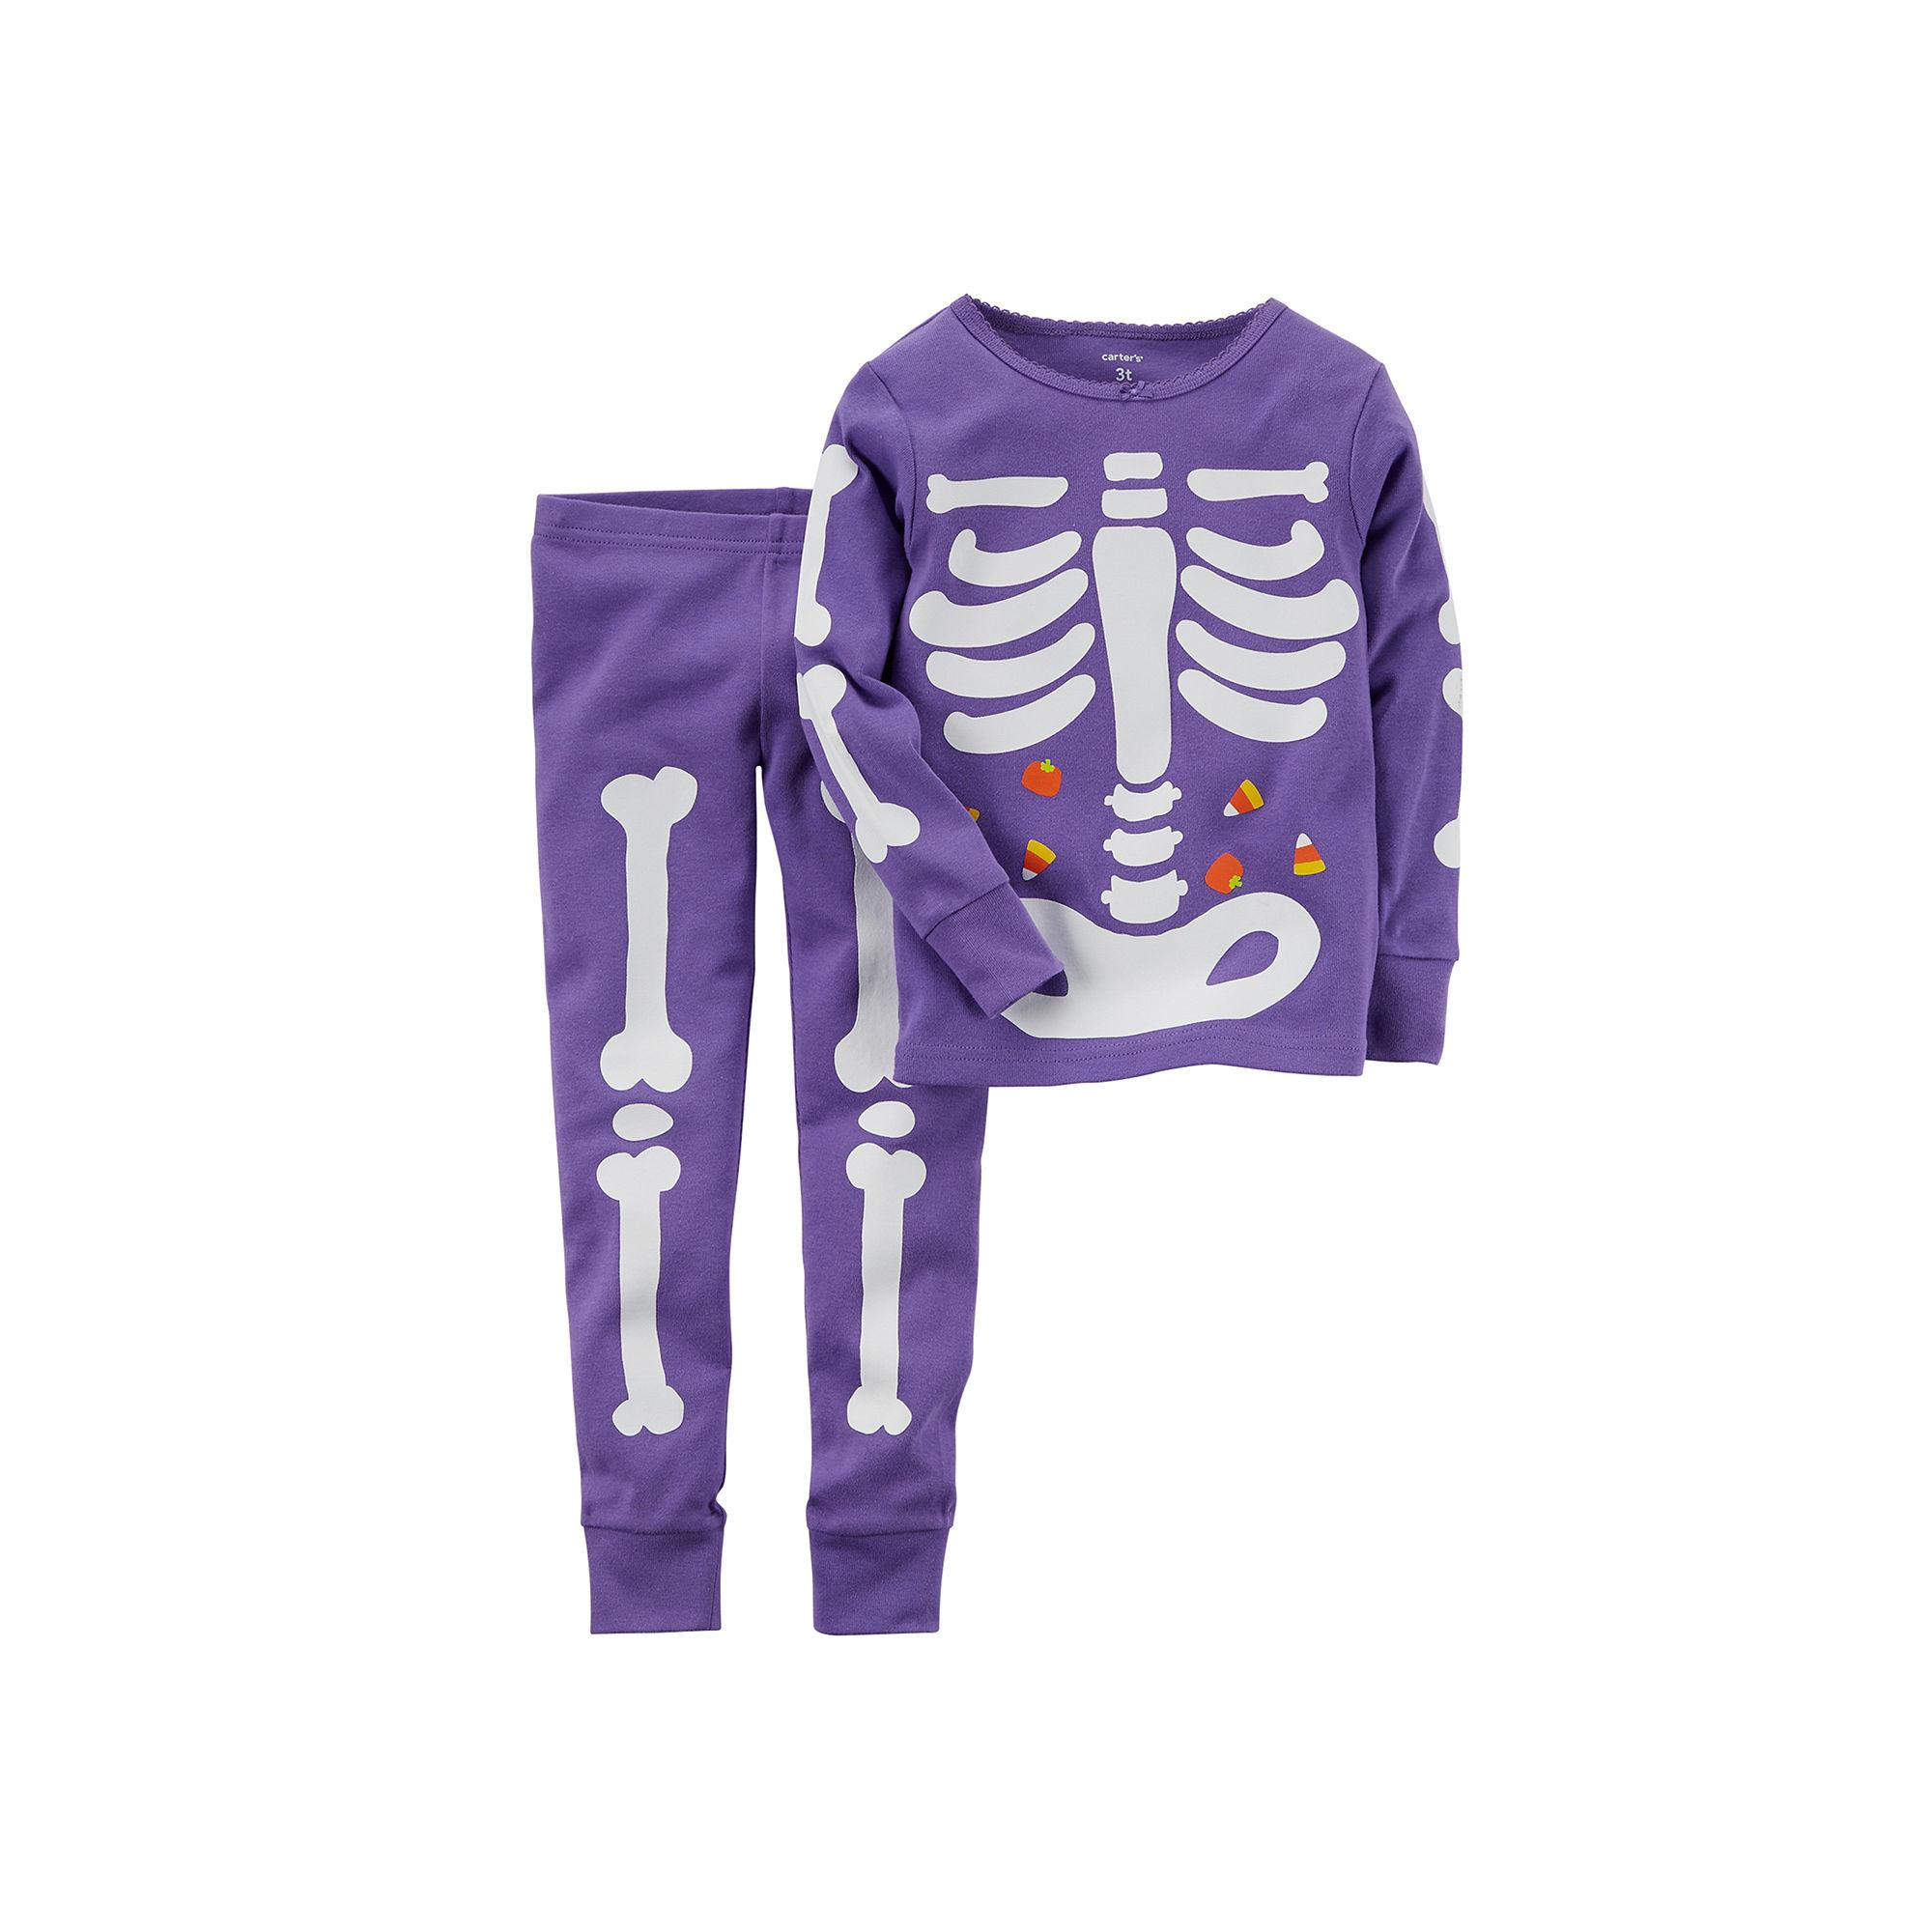 bce0371f8 UPC 888510856290 product image for Carter's Glow-in-the-Dark Skeleton  Pajamas ...